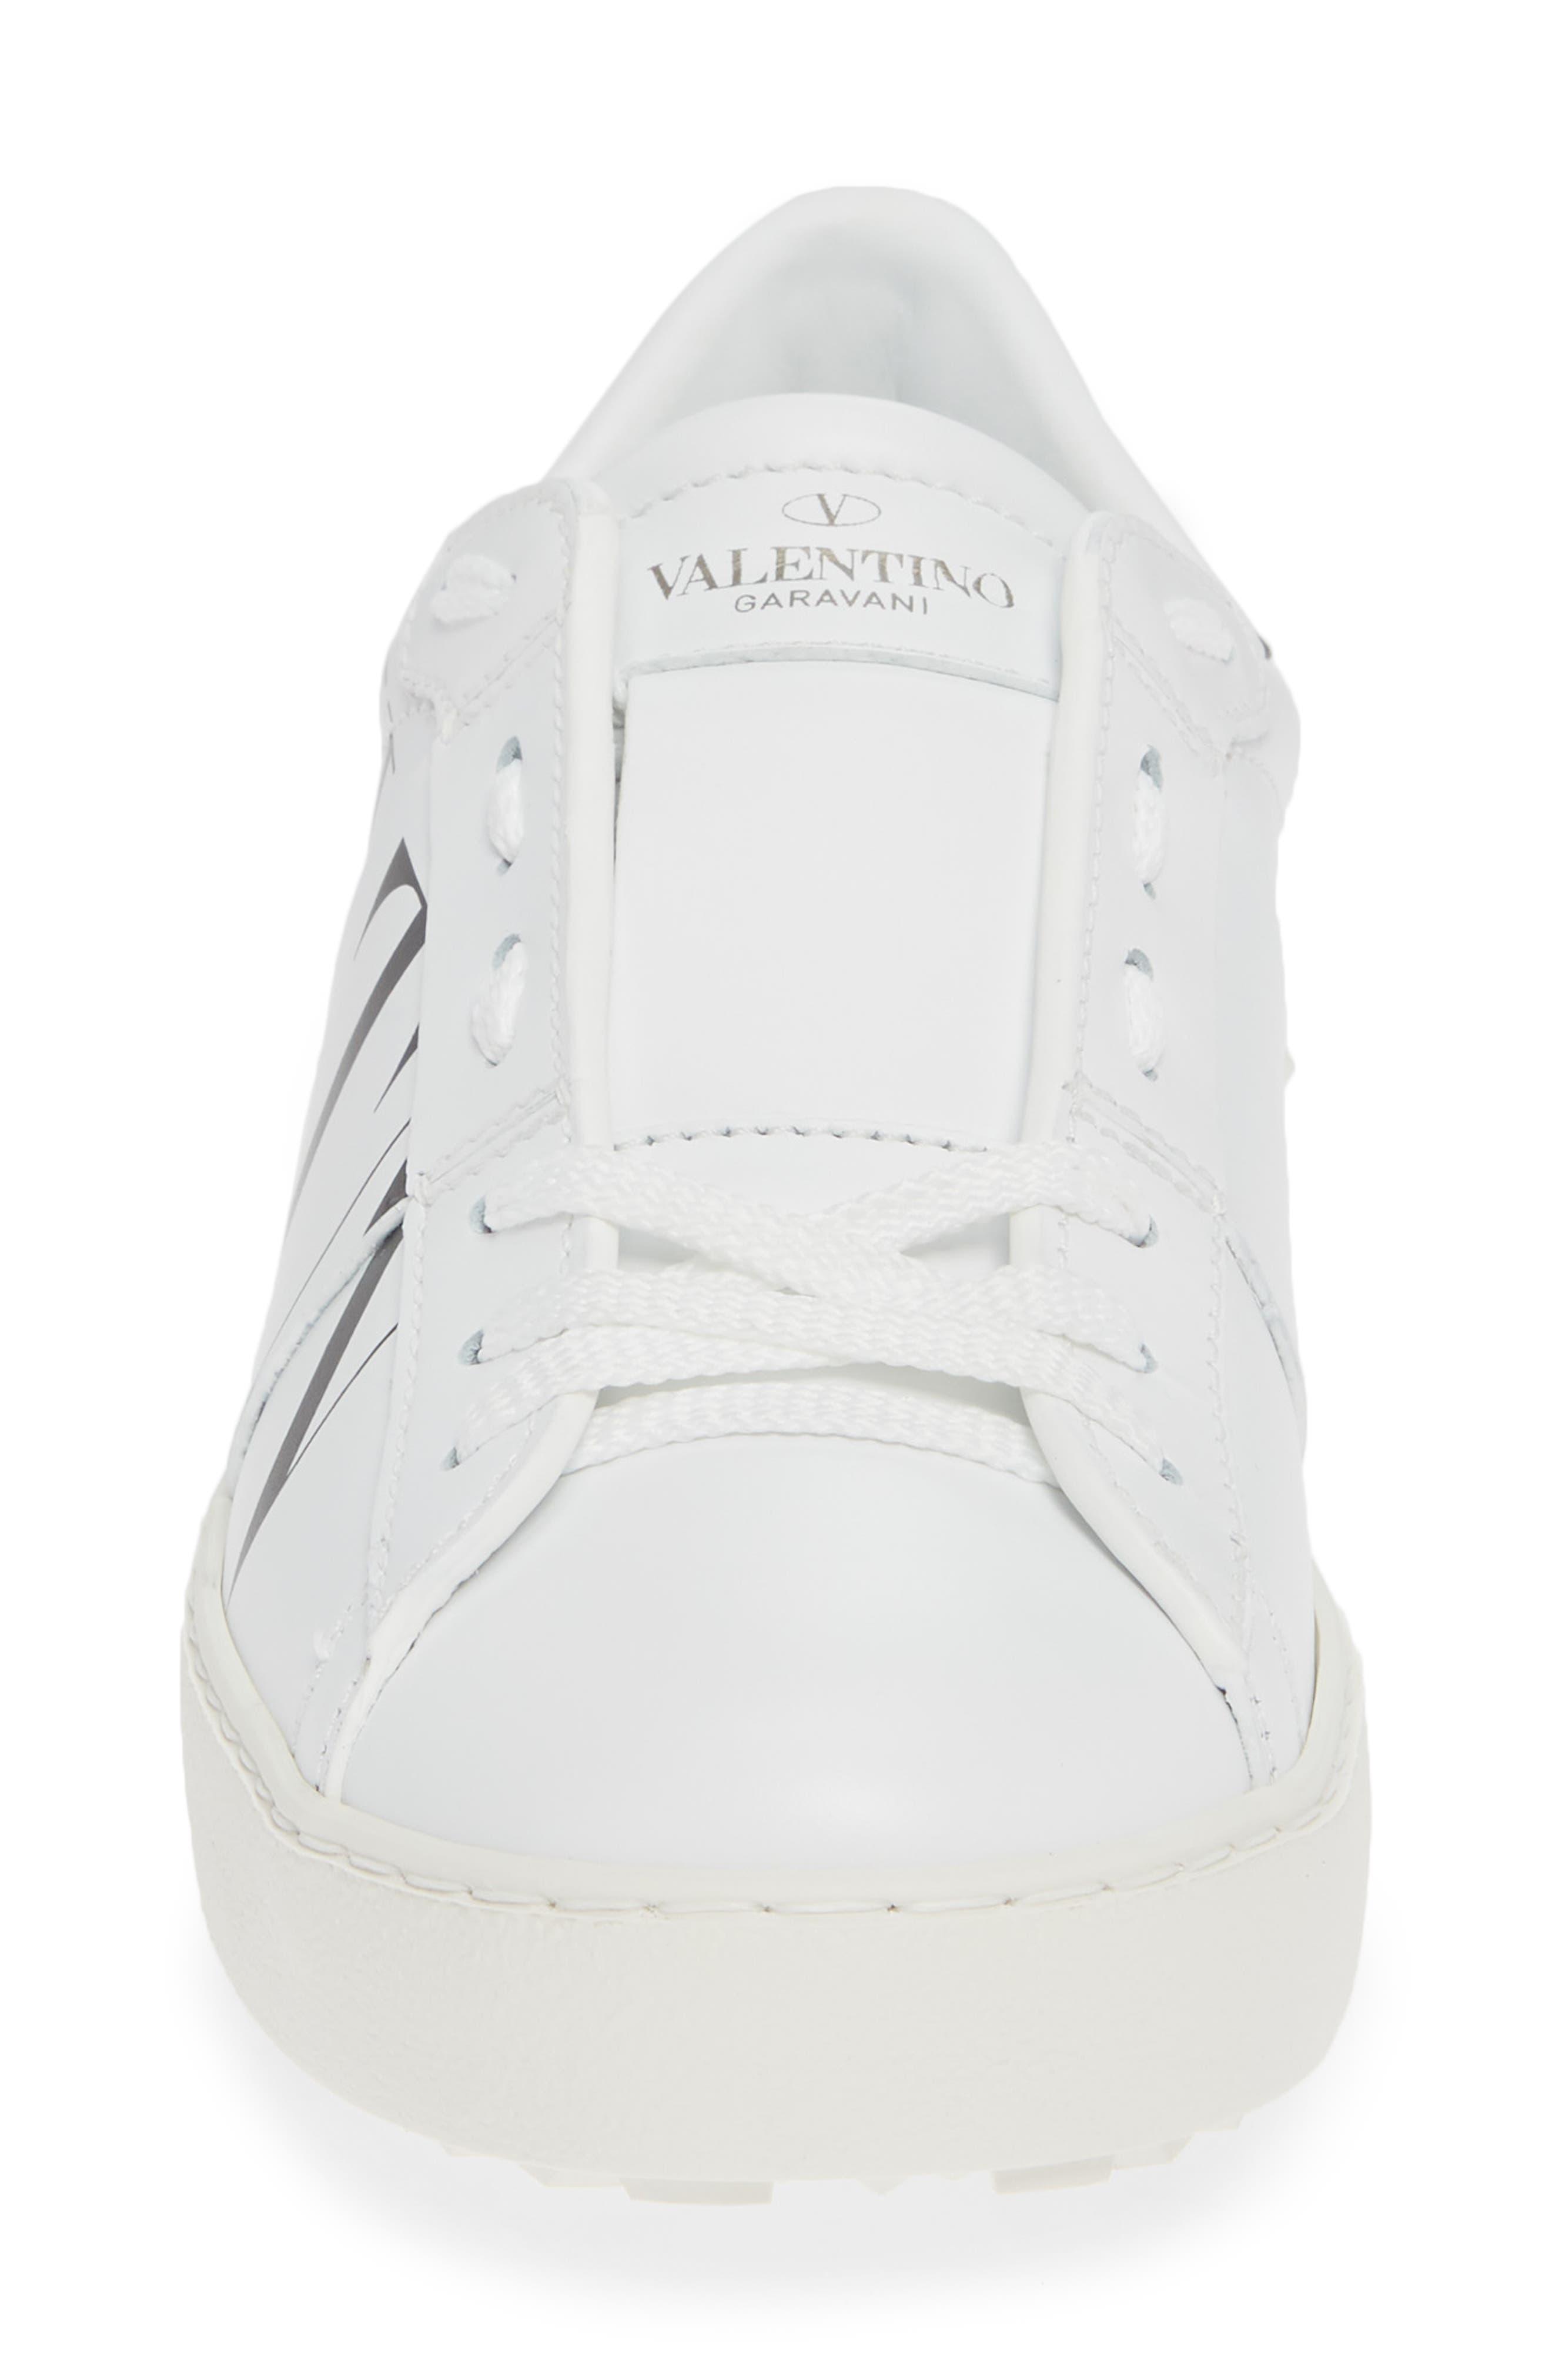 VALENTINO GARAVANI,                             VLTN Logo Low Top Sneaker,                             Alternate thumbnail 4, color,                             102